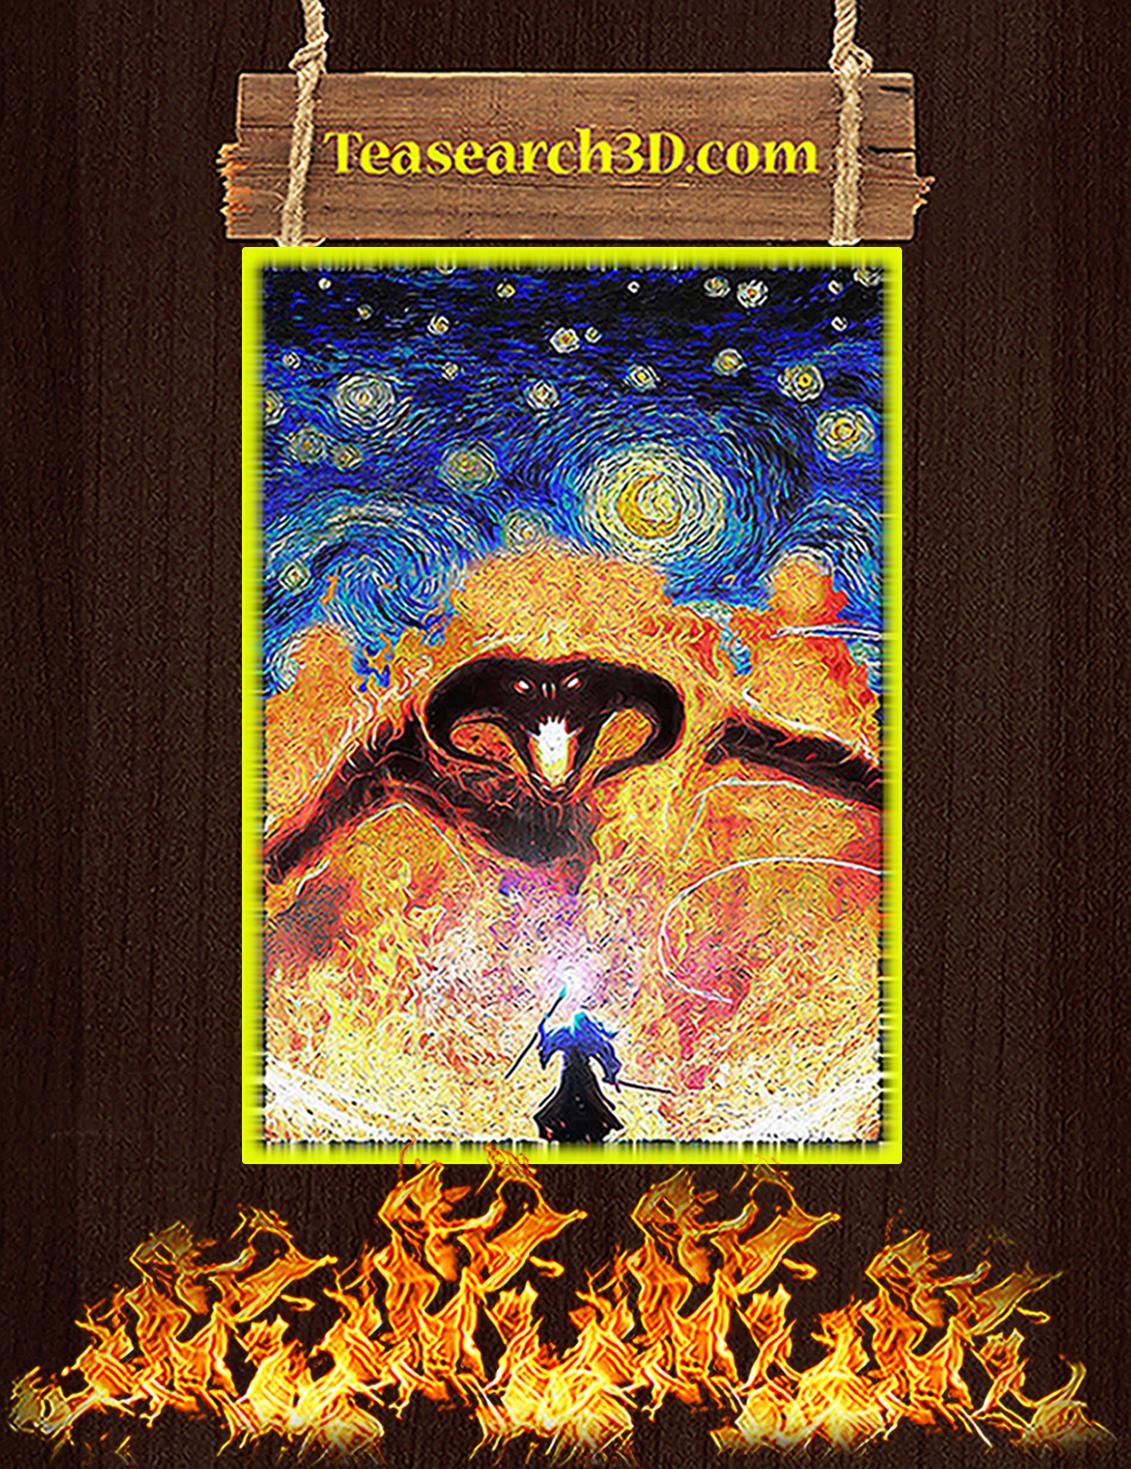 Balrog LOTR fire demon starry night poster A3